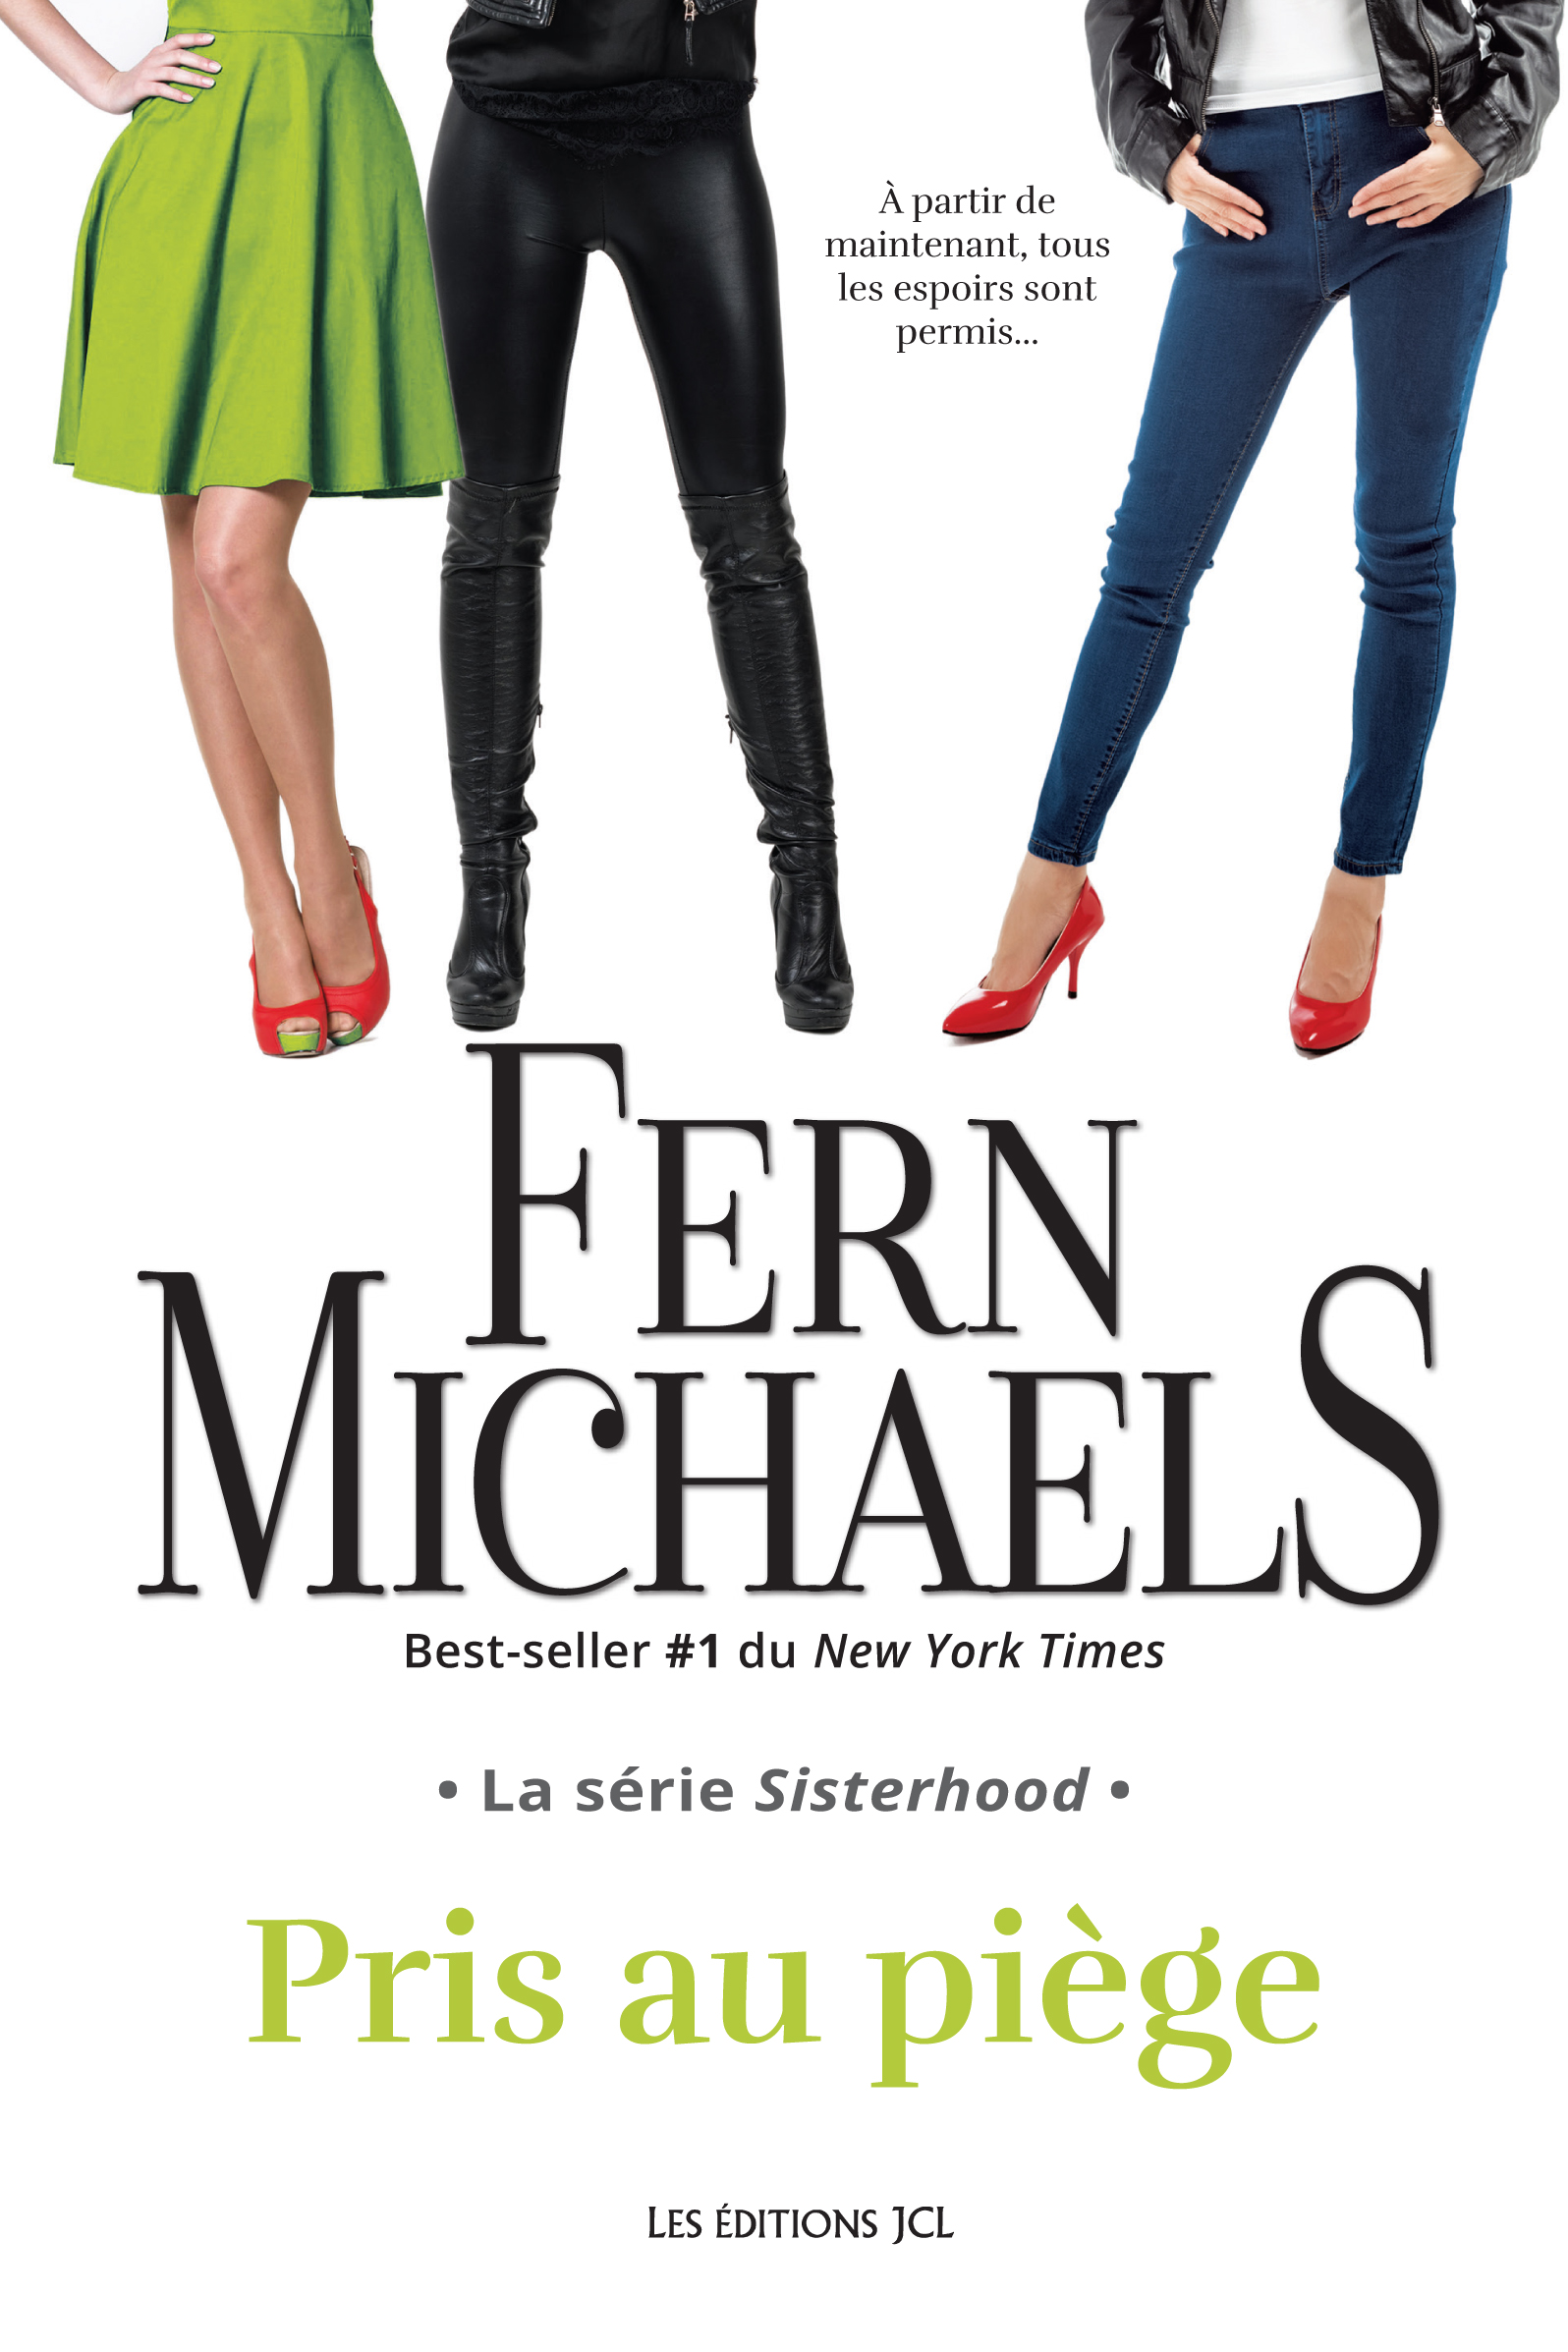 La série Sisterhood, Pris au piège